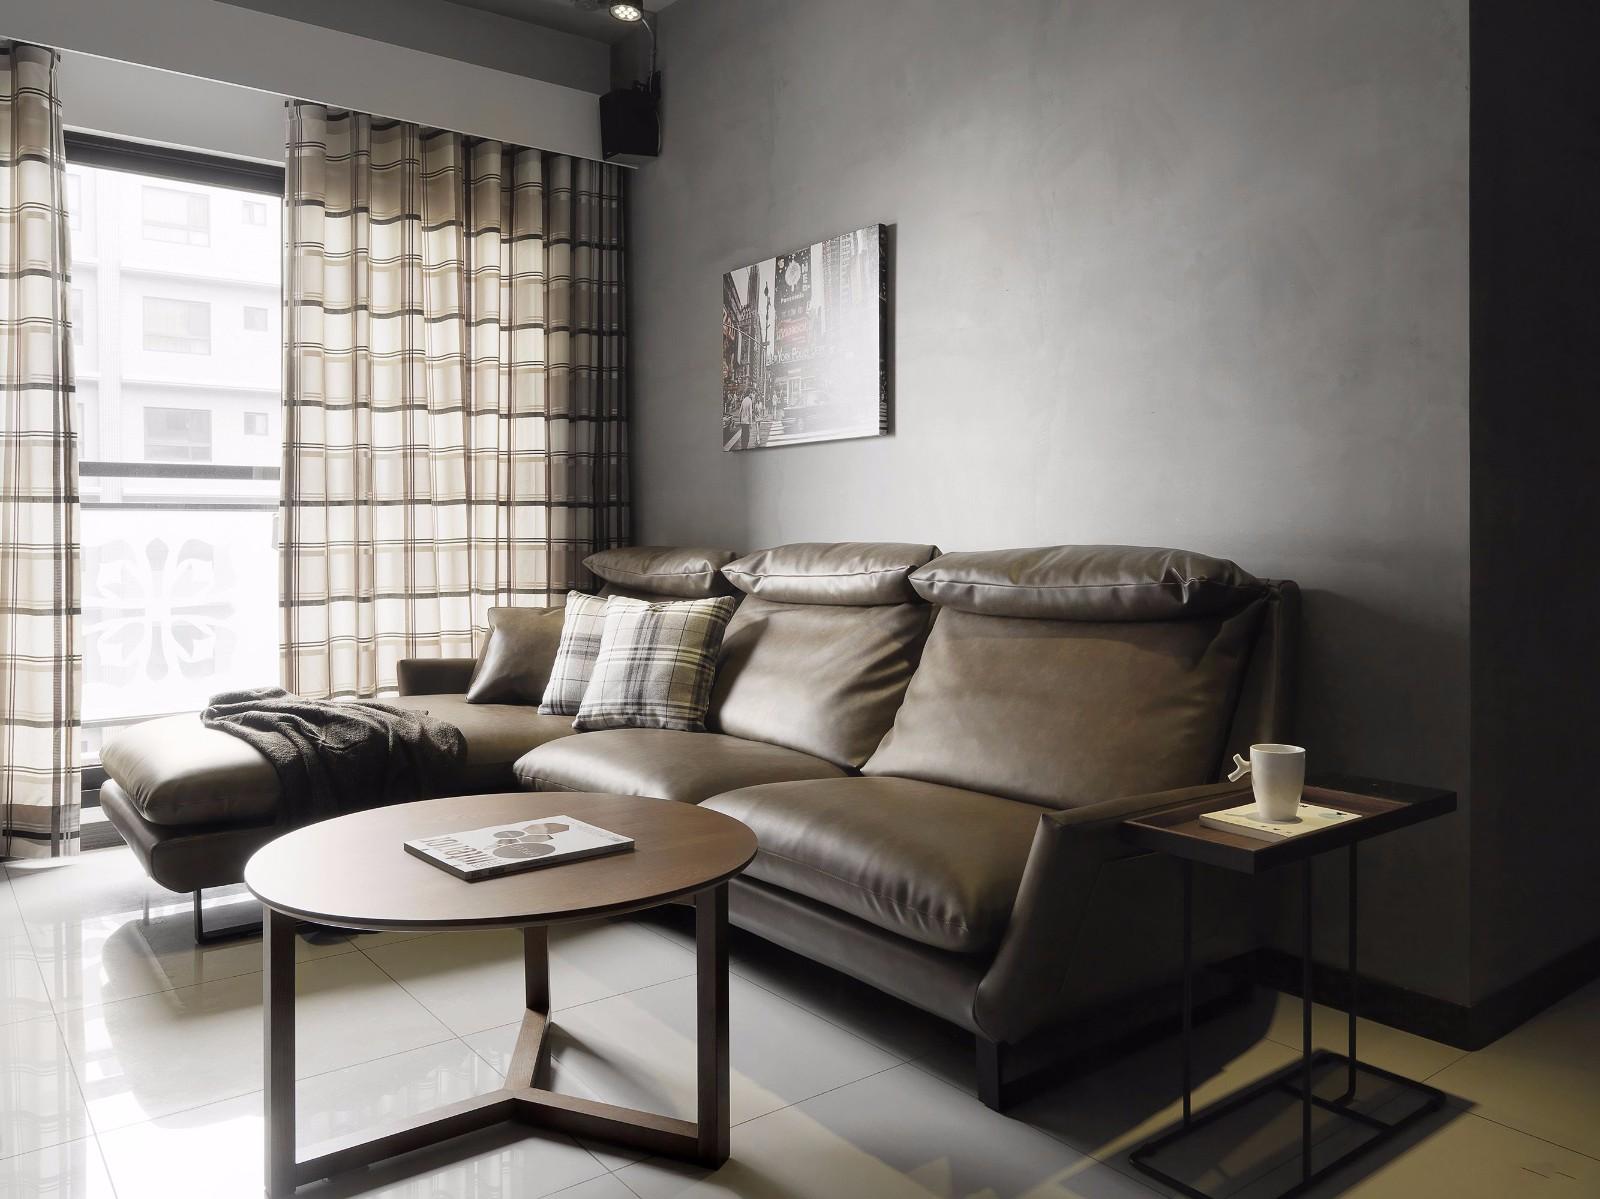 LOFT工业风三居沙发背景墙装修效果图